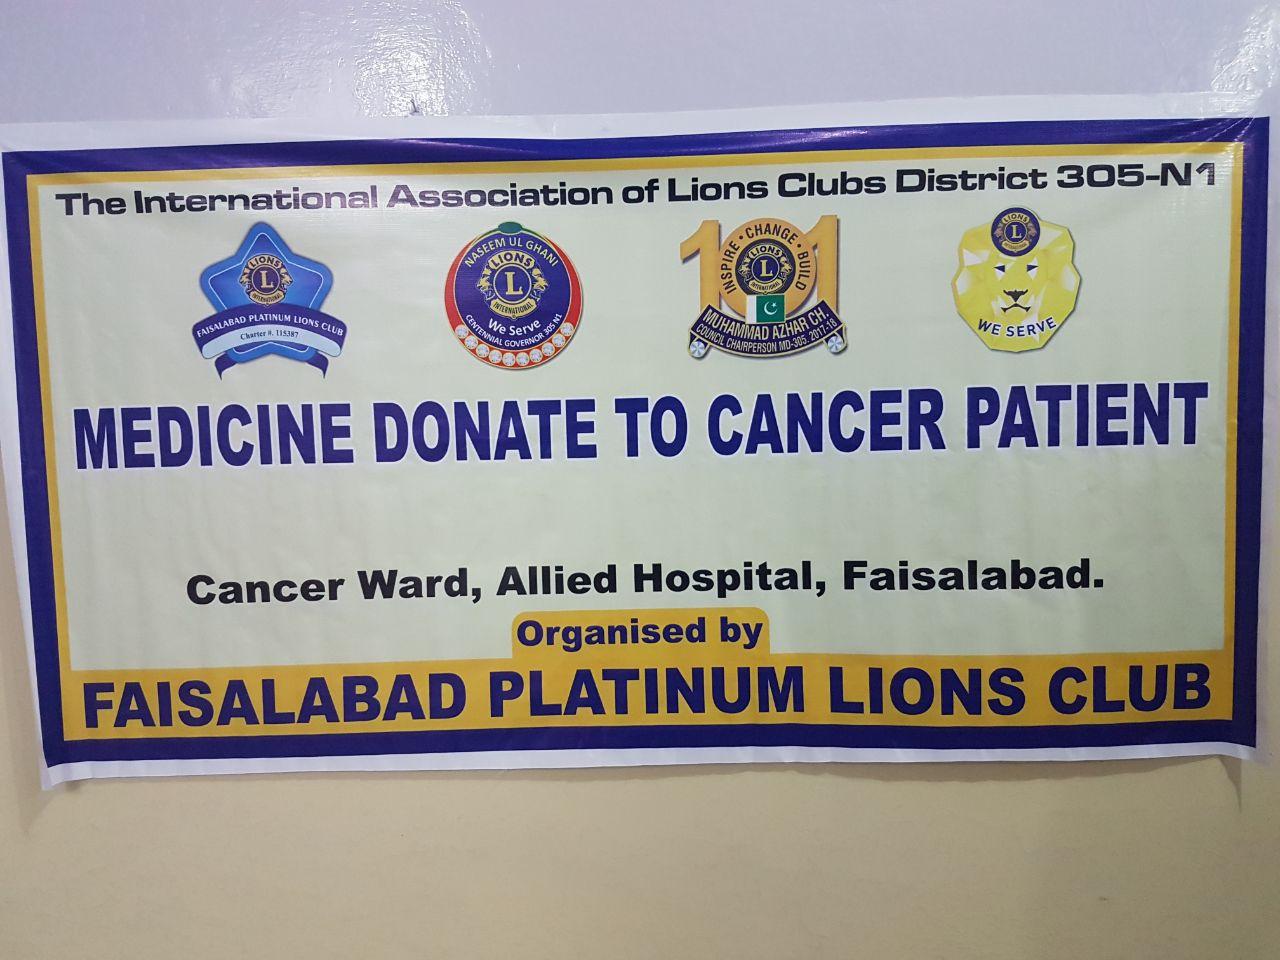 CHEMOTHERAPY DONATION